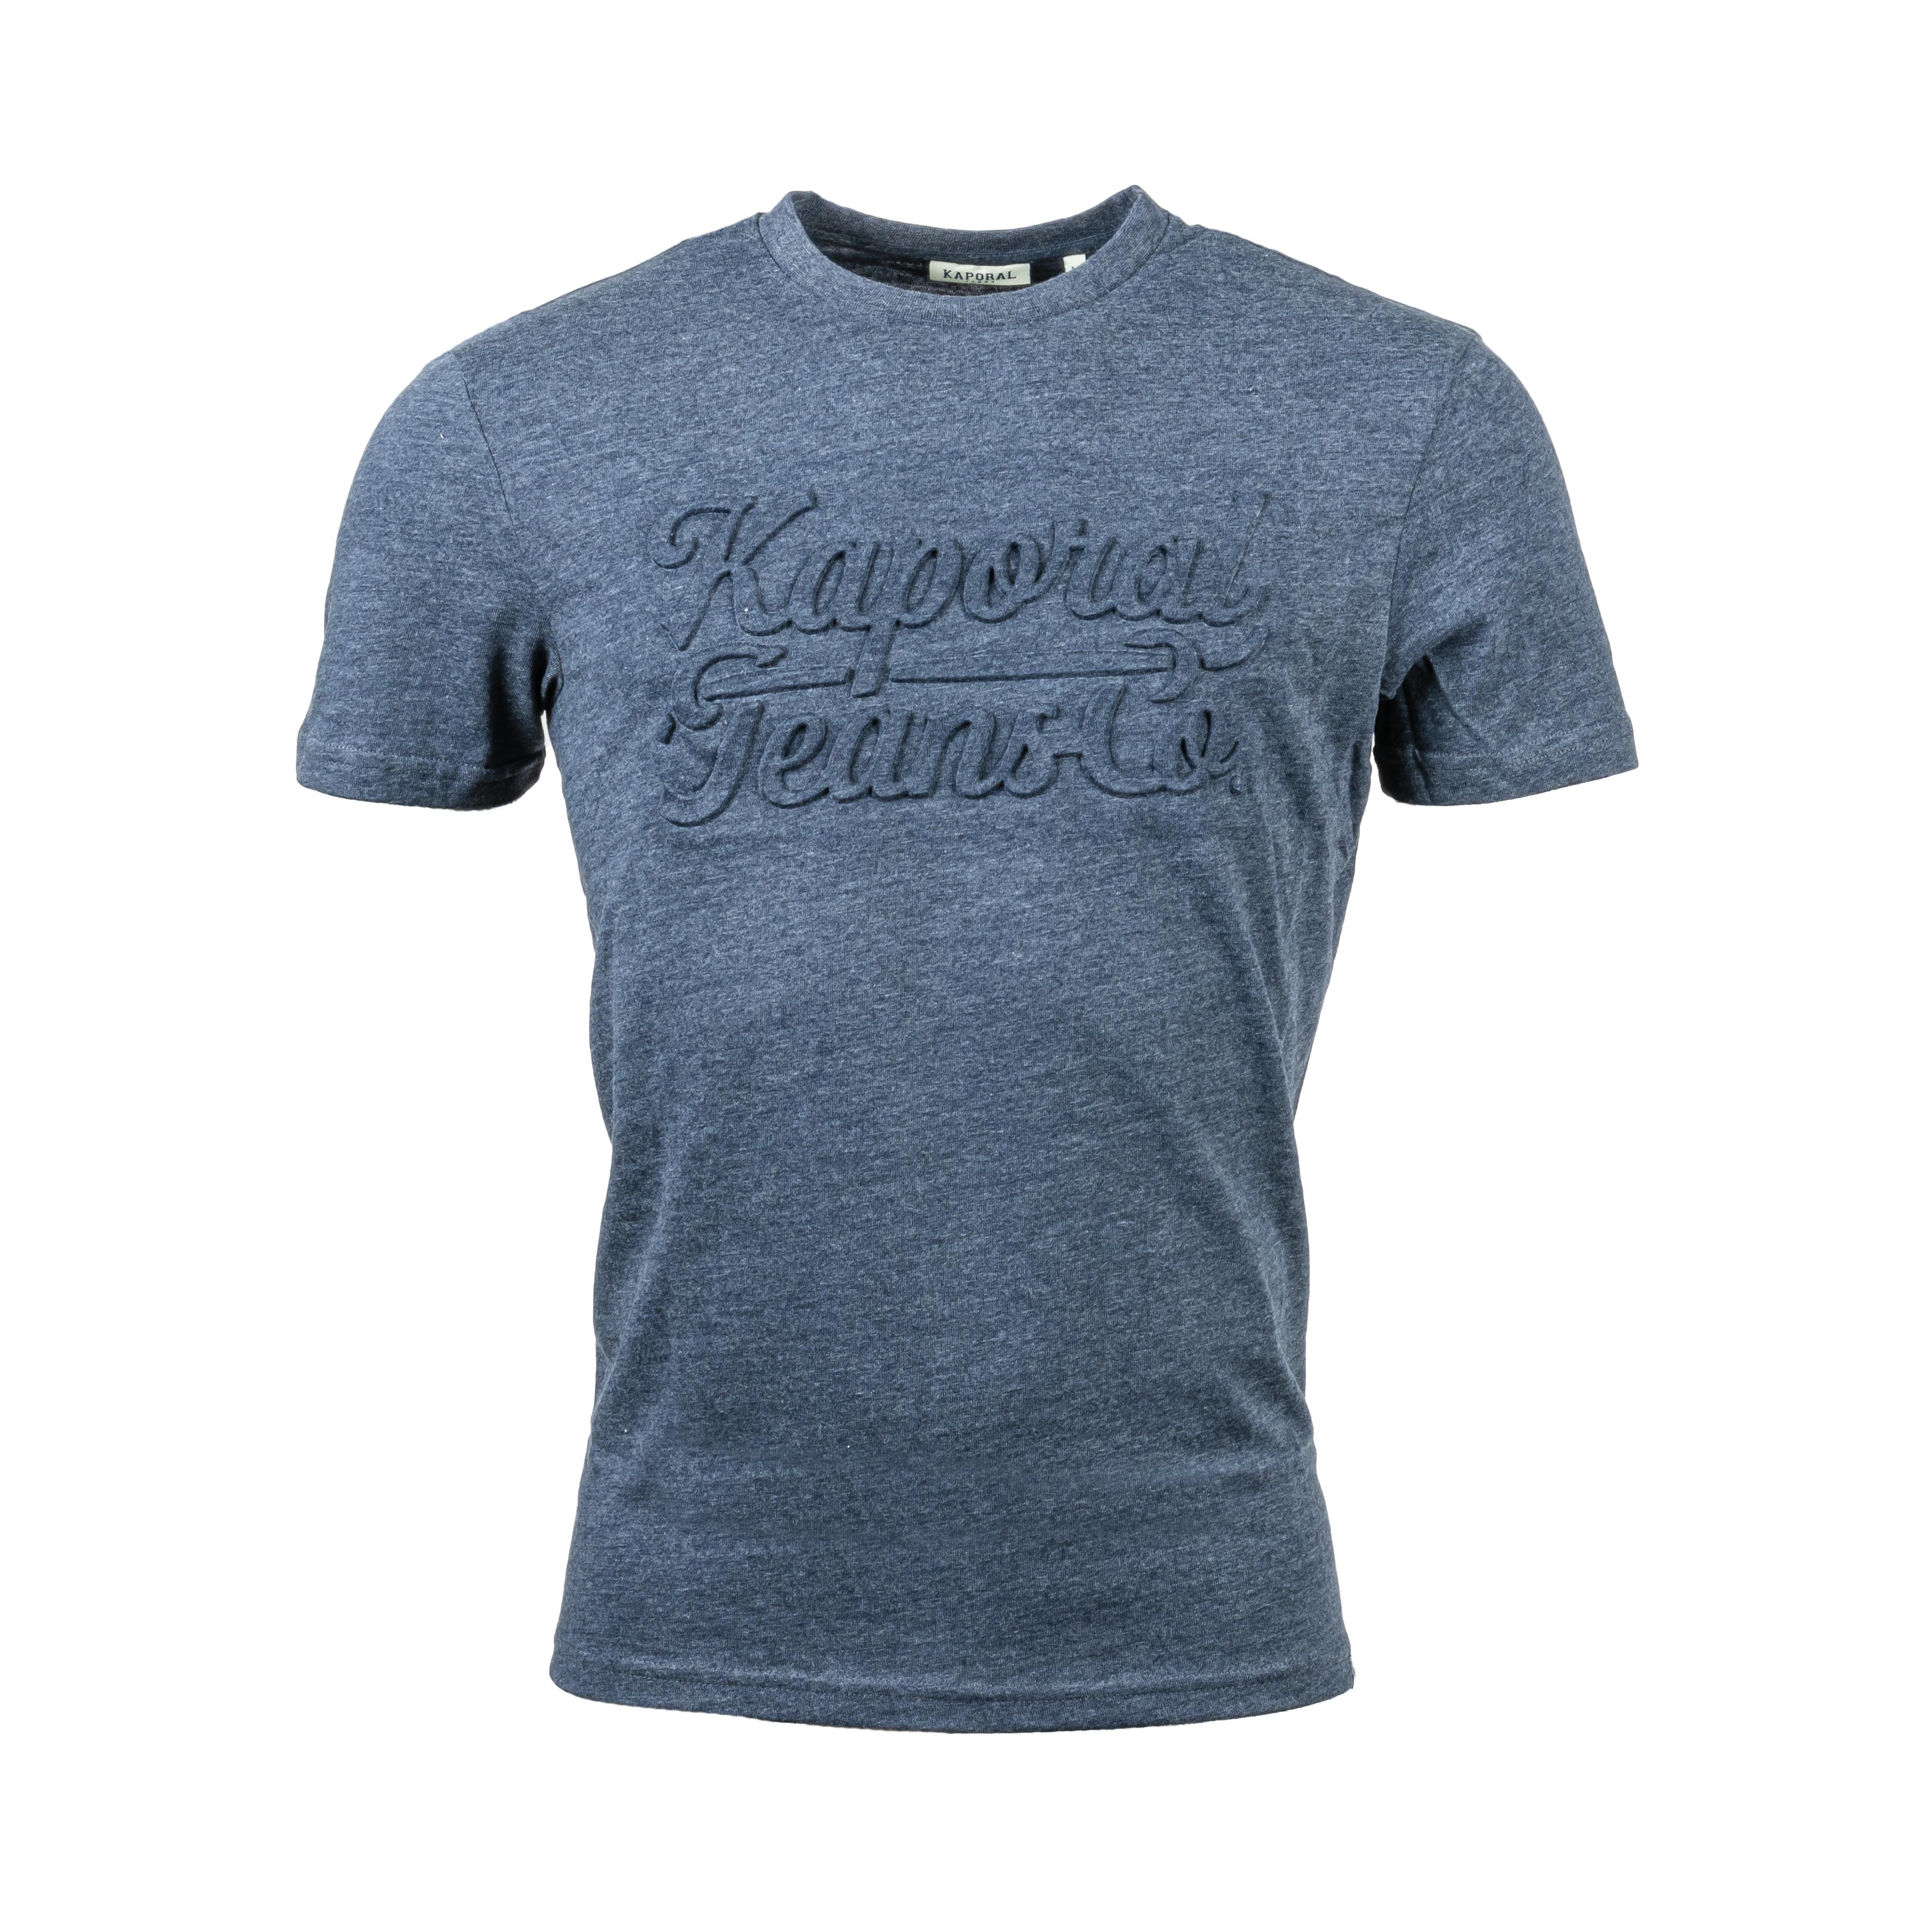 Tee-shirt col rond  omed en coton mélangé bleu nuit